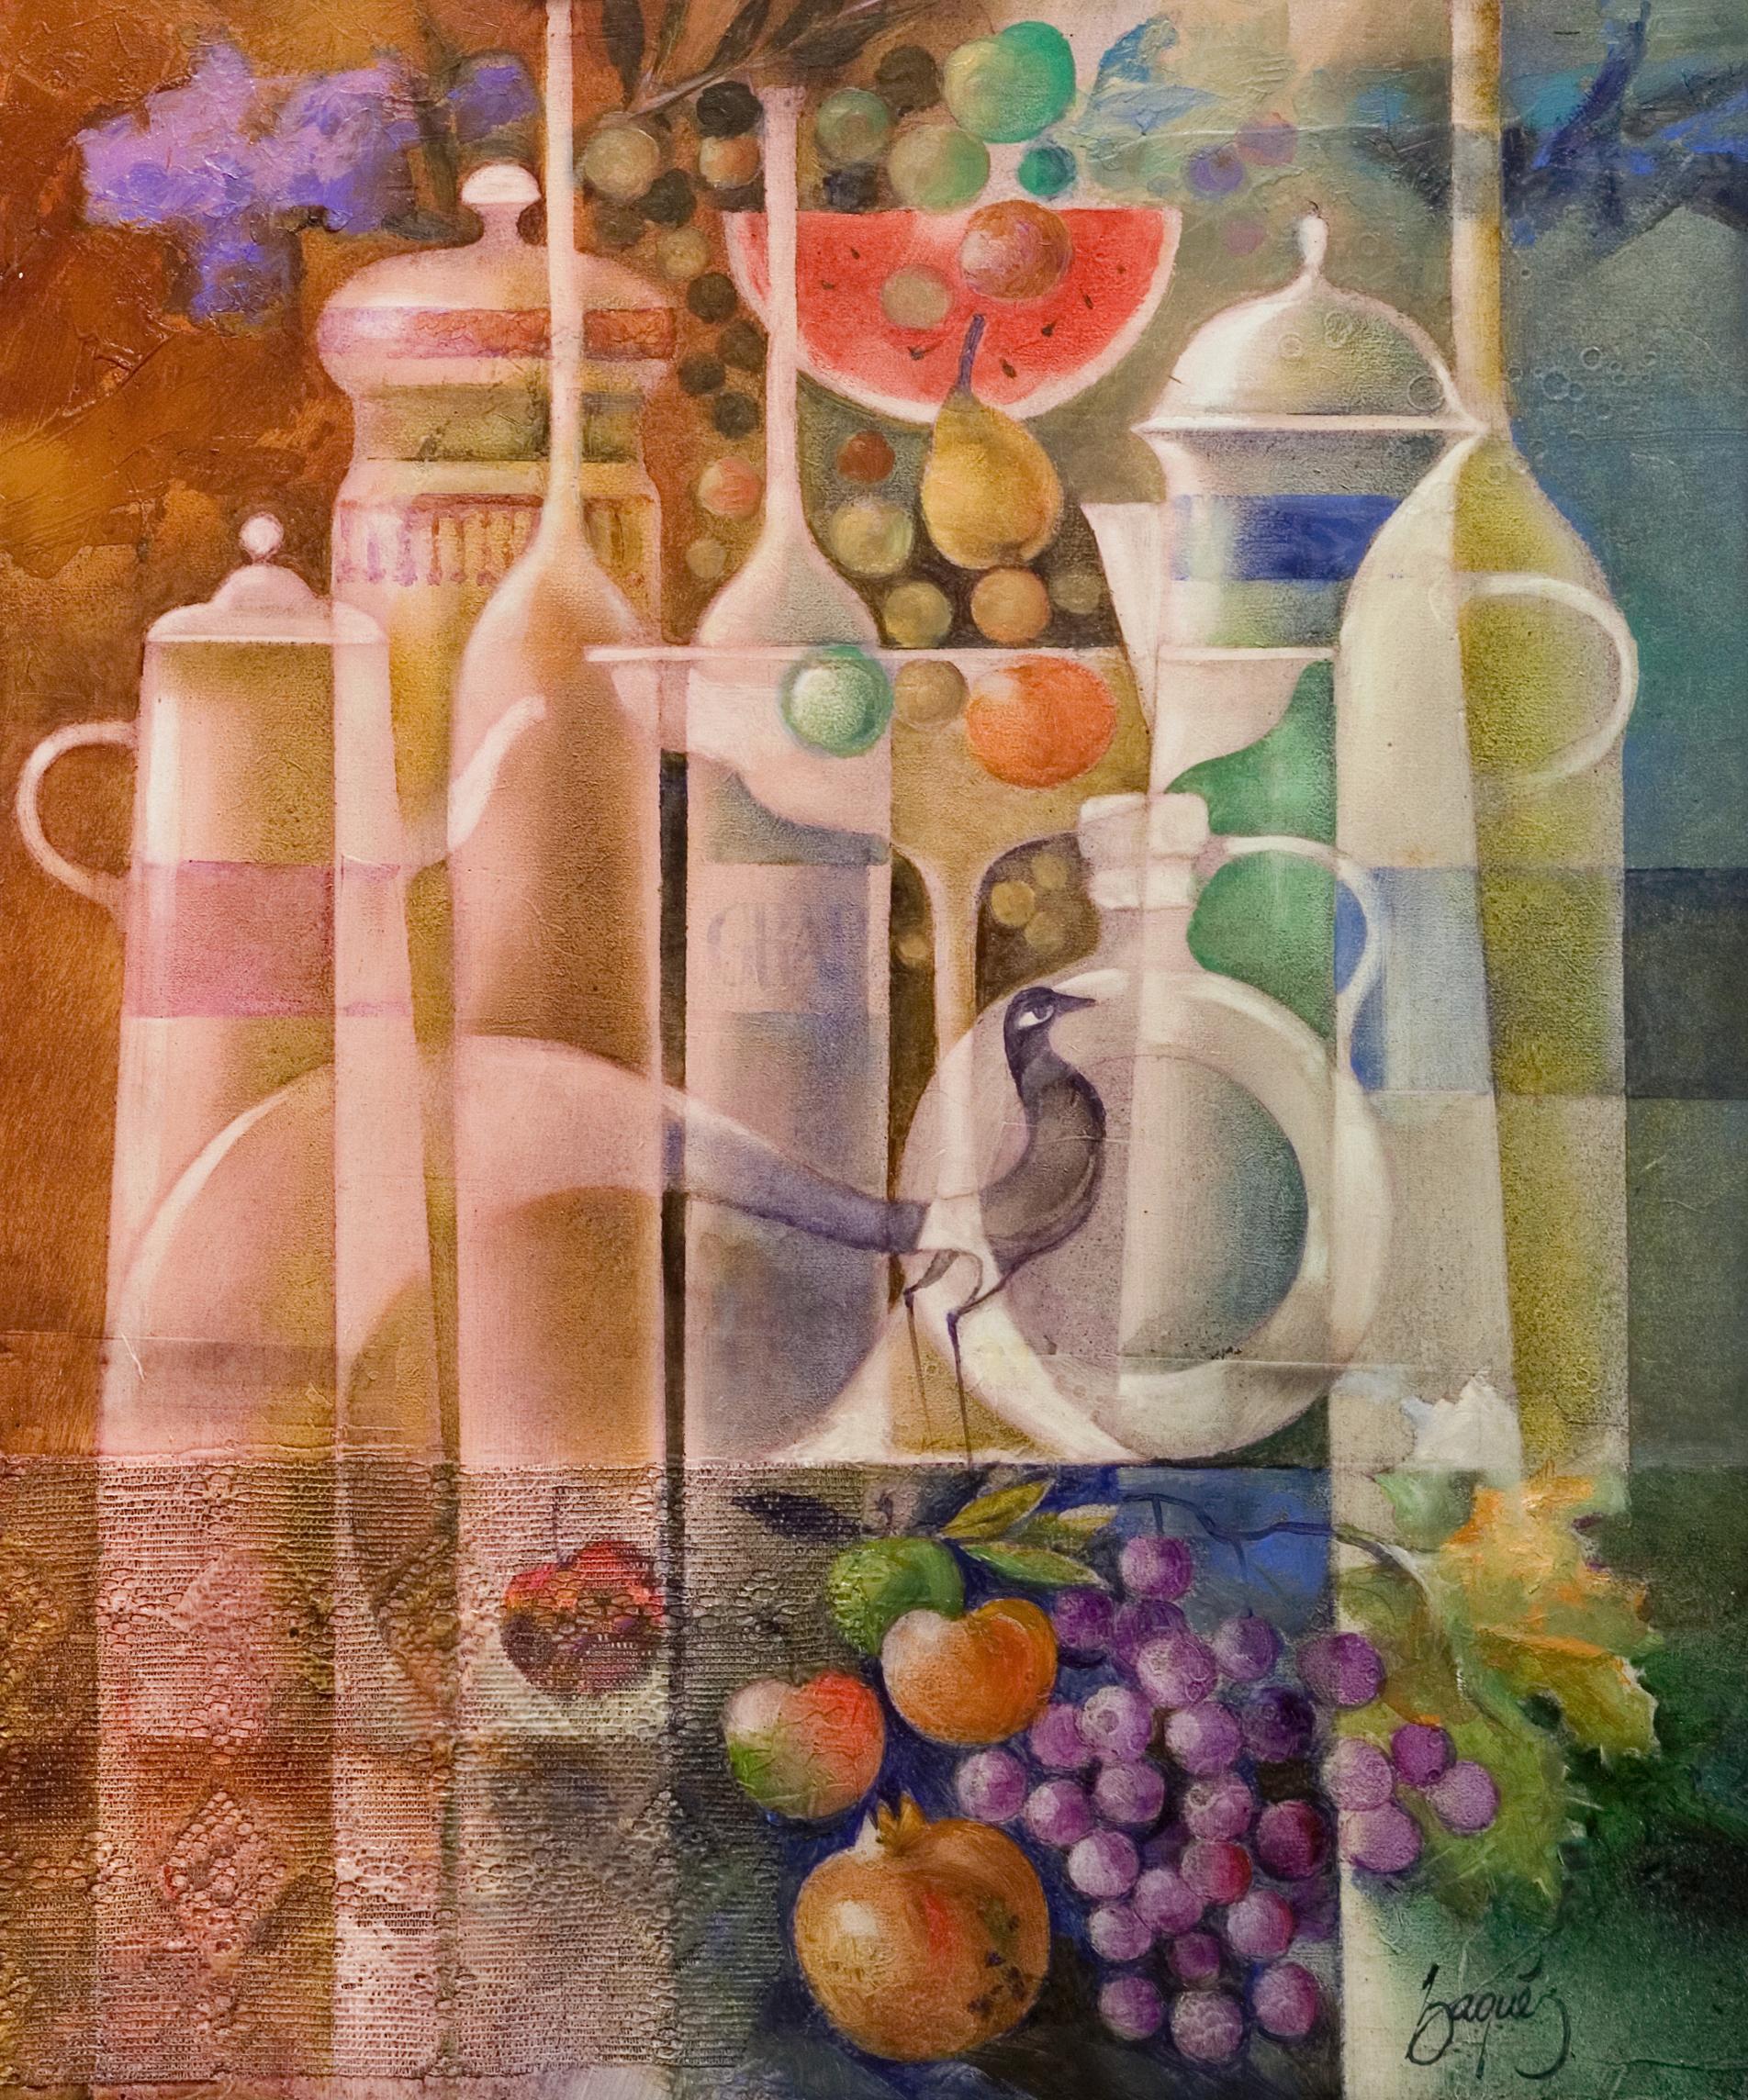 Bodego Amb Ceramiques I Fruites-EB